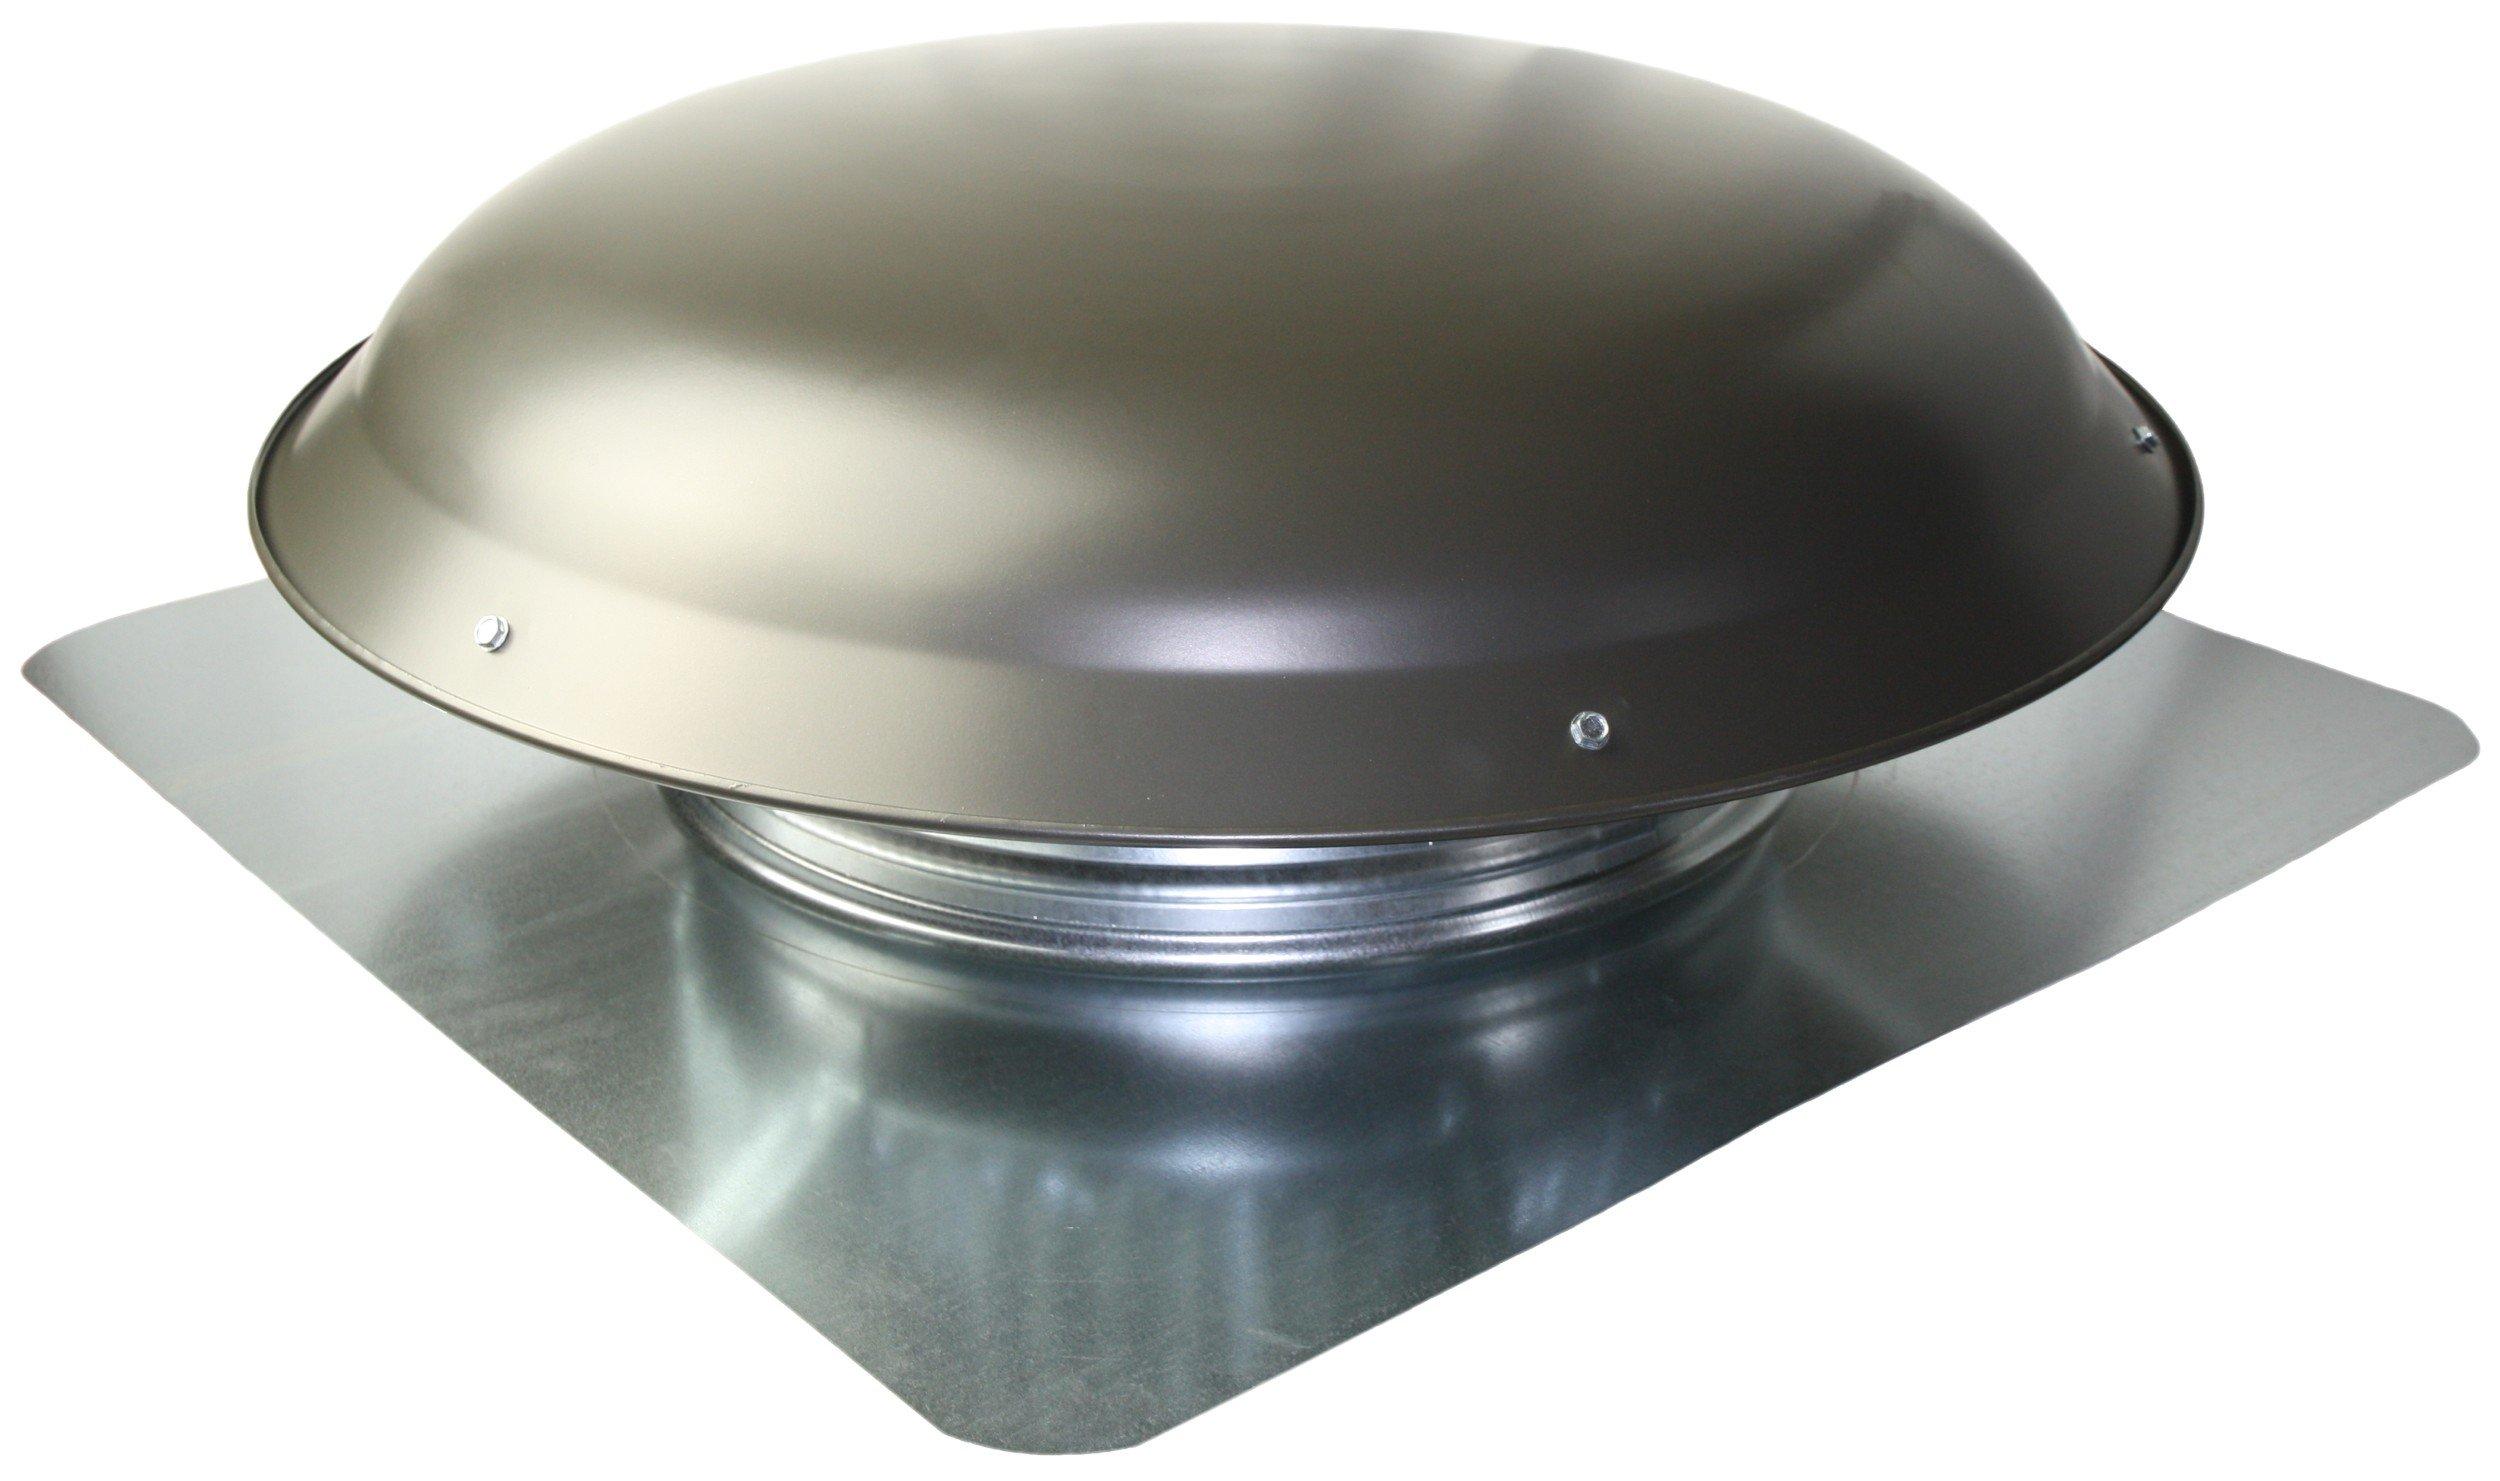 Ventamatic VX25 GREYUPS Static Galvanized Steel Dome & Flange Roof Vent, Weathered Grey,